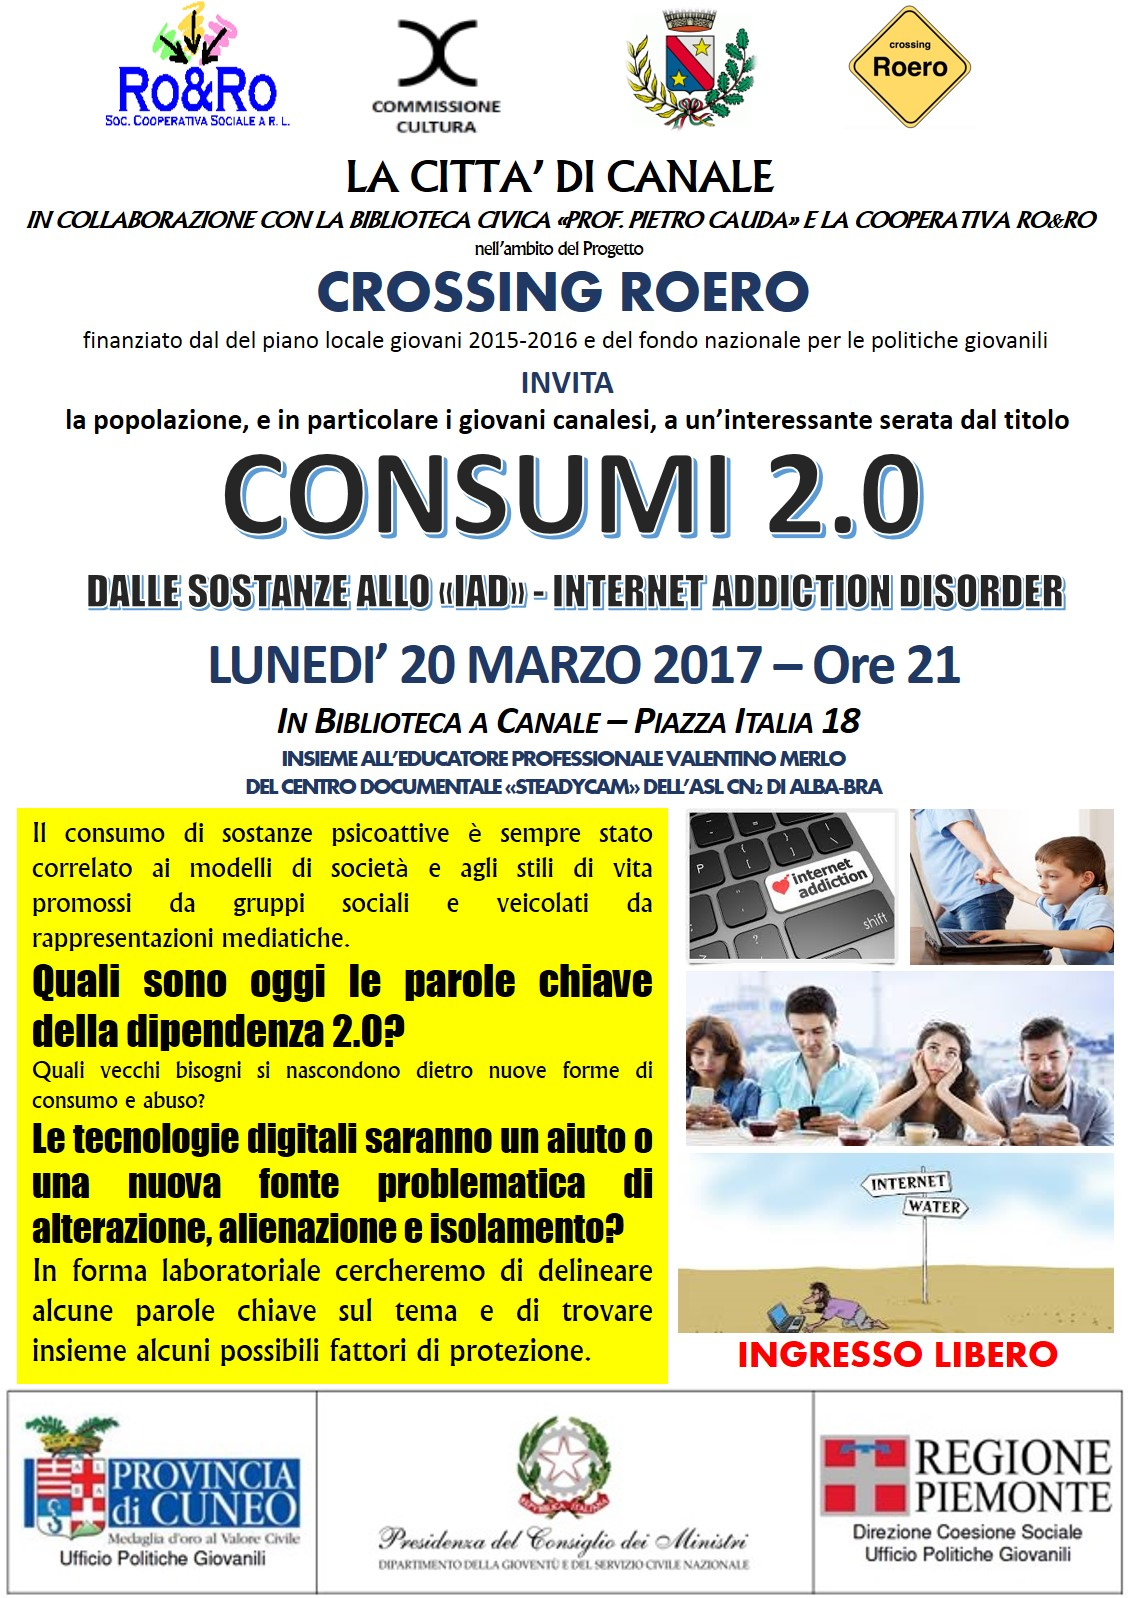 Internet Addiction Disorder_20.03.2017